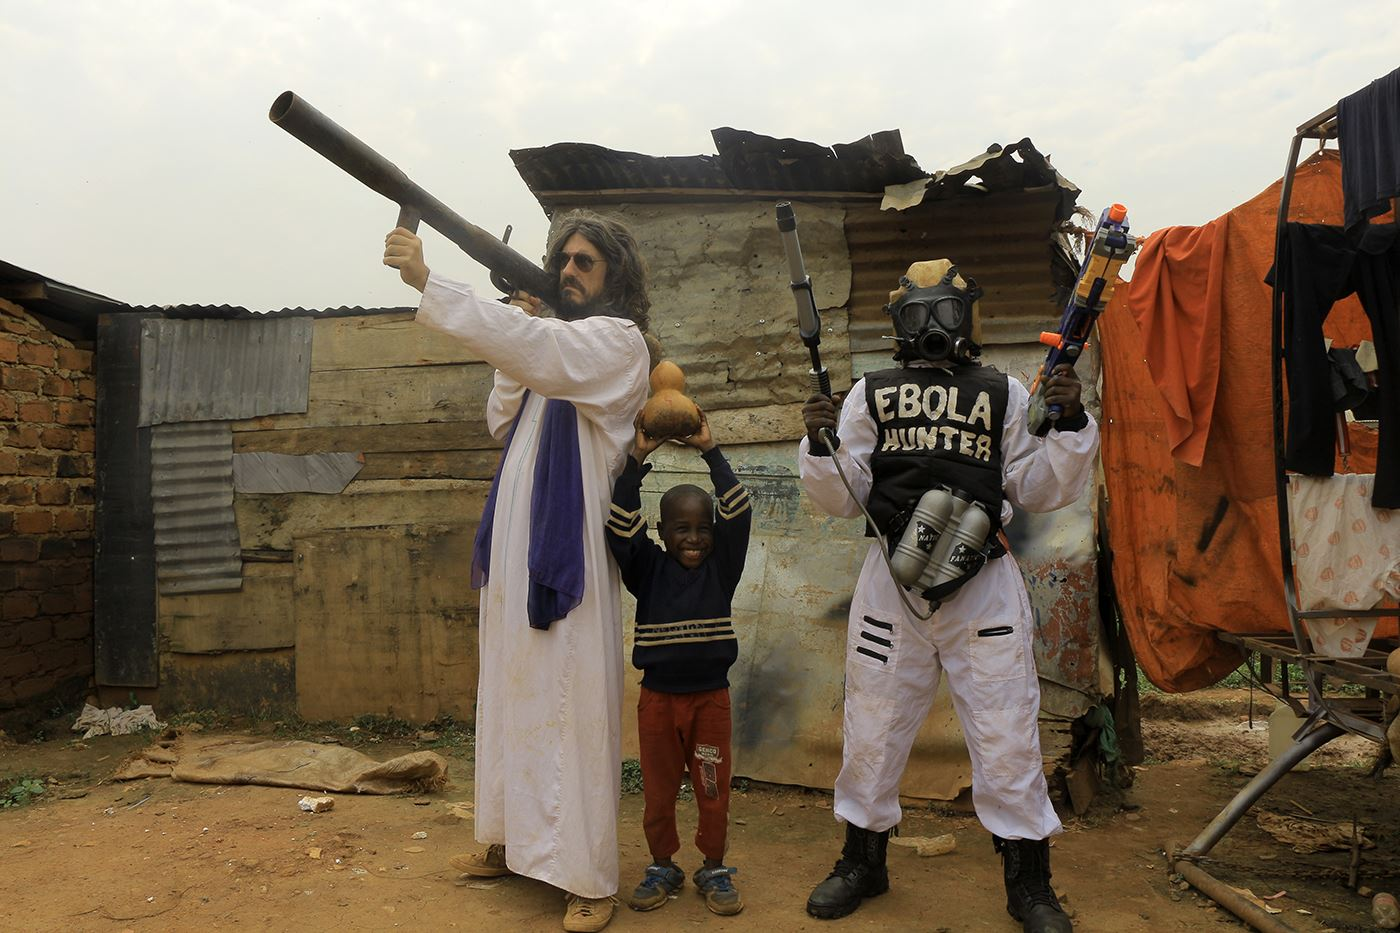 Wakaliwood ebola hunter